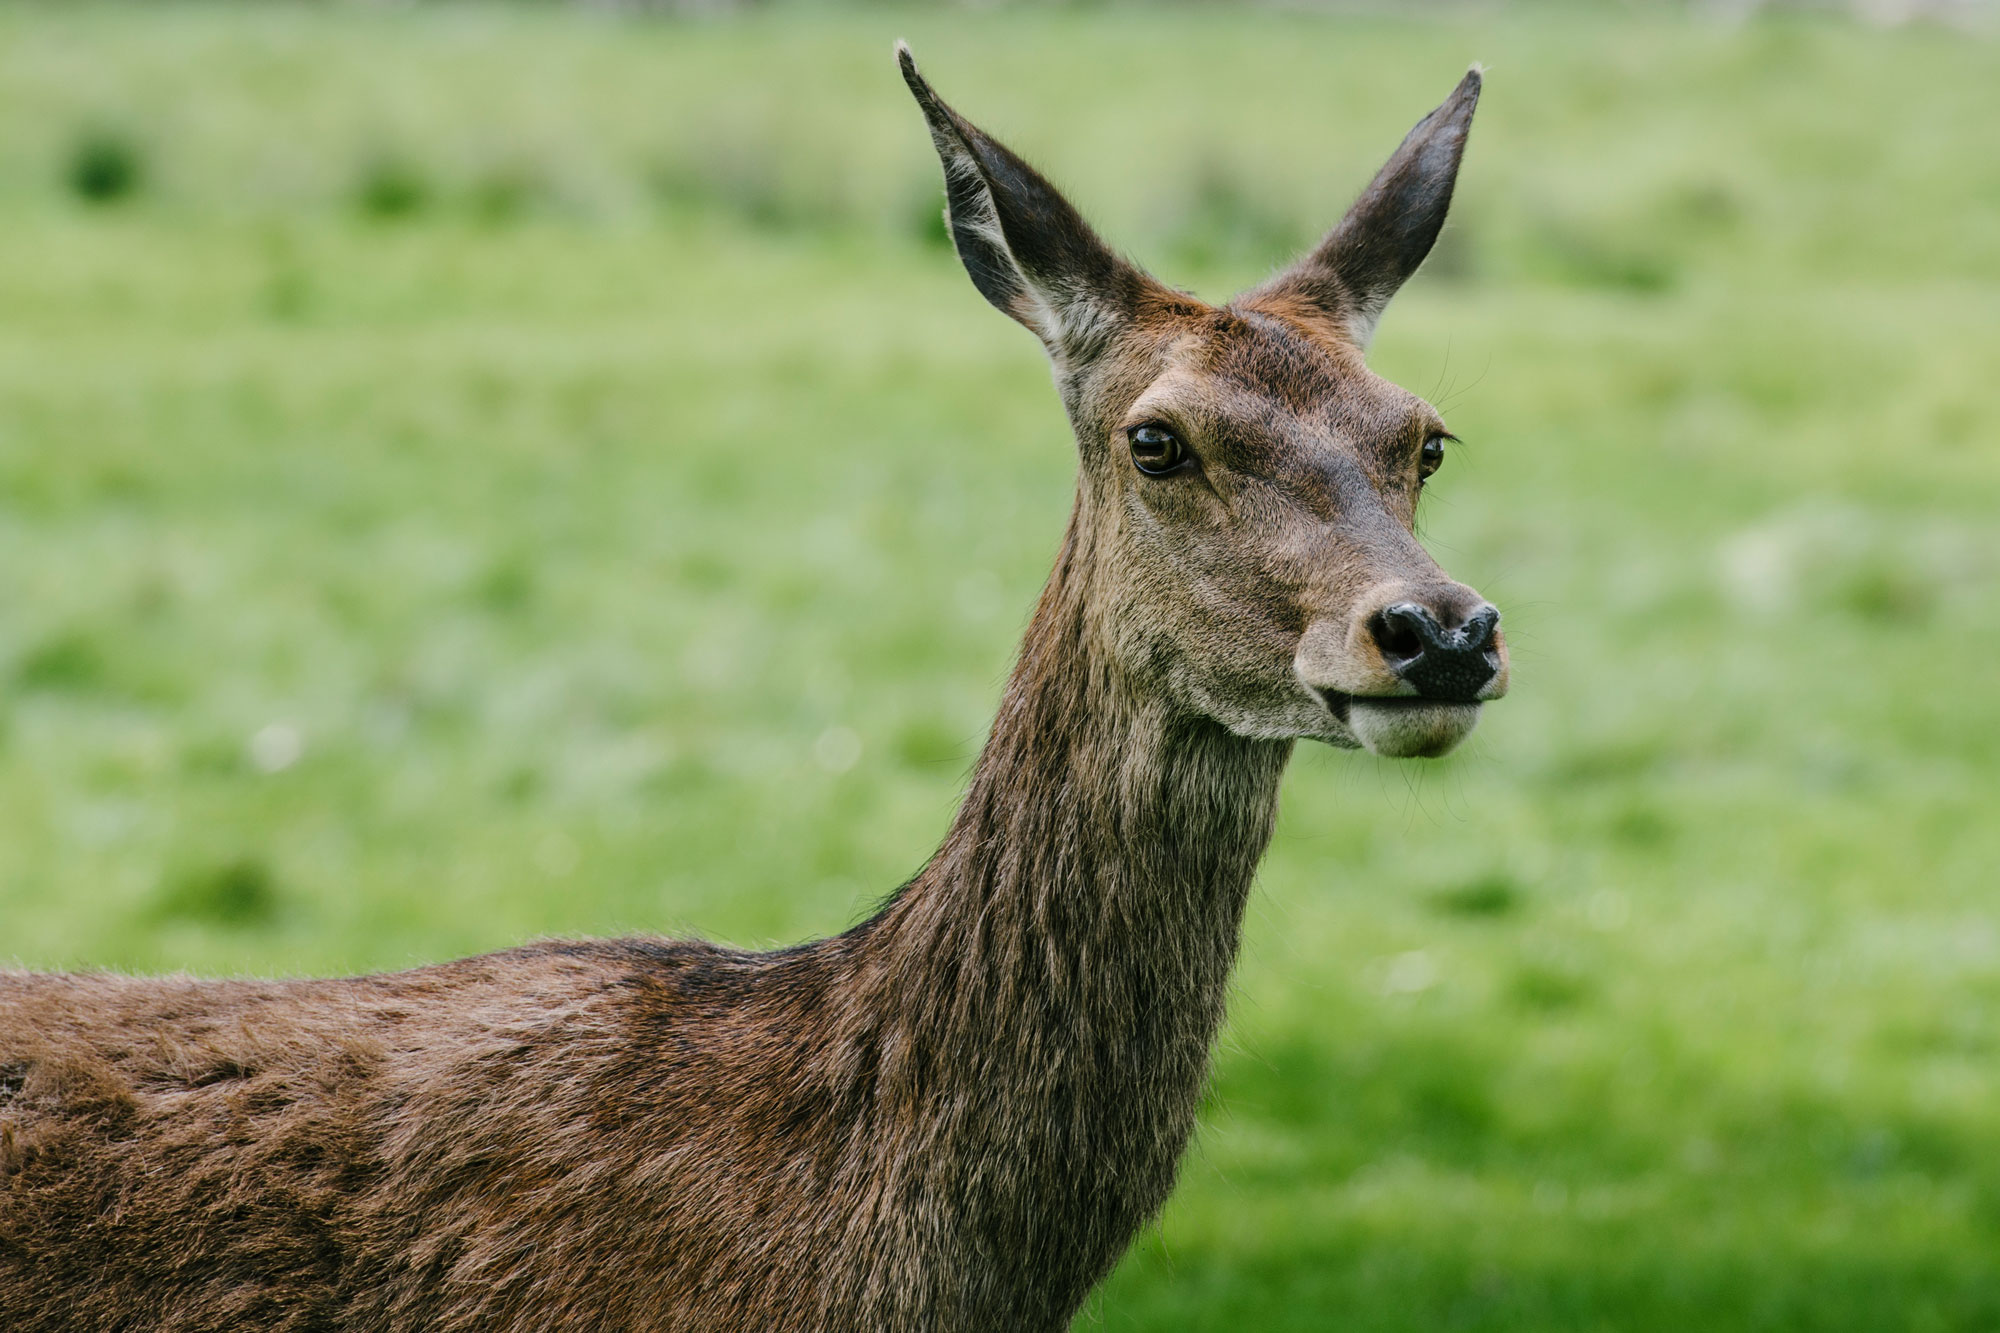 Deer-RichmondPark-Wildlife-AlbertoPiroddiPhotography